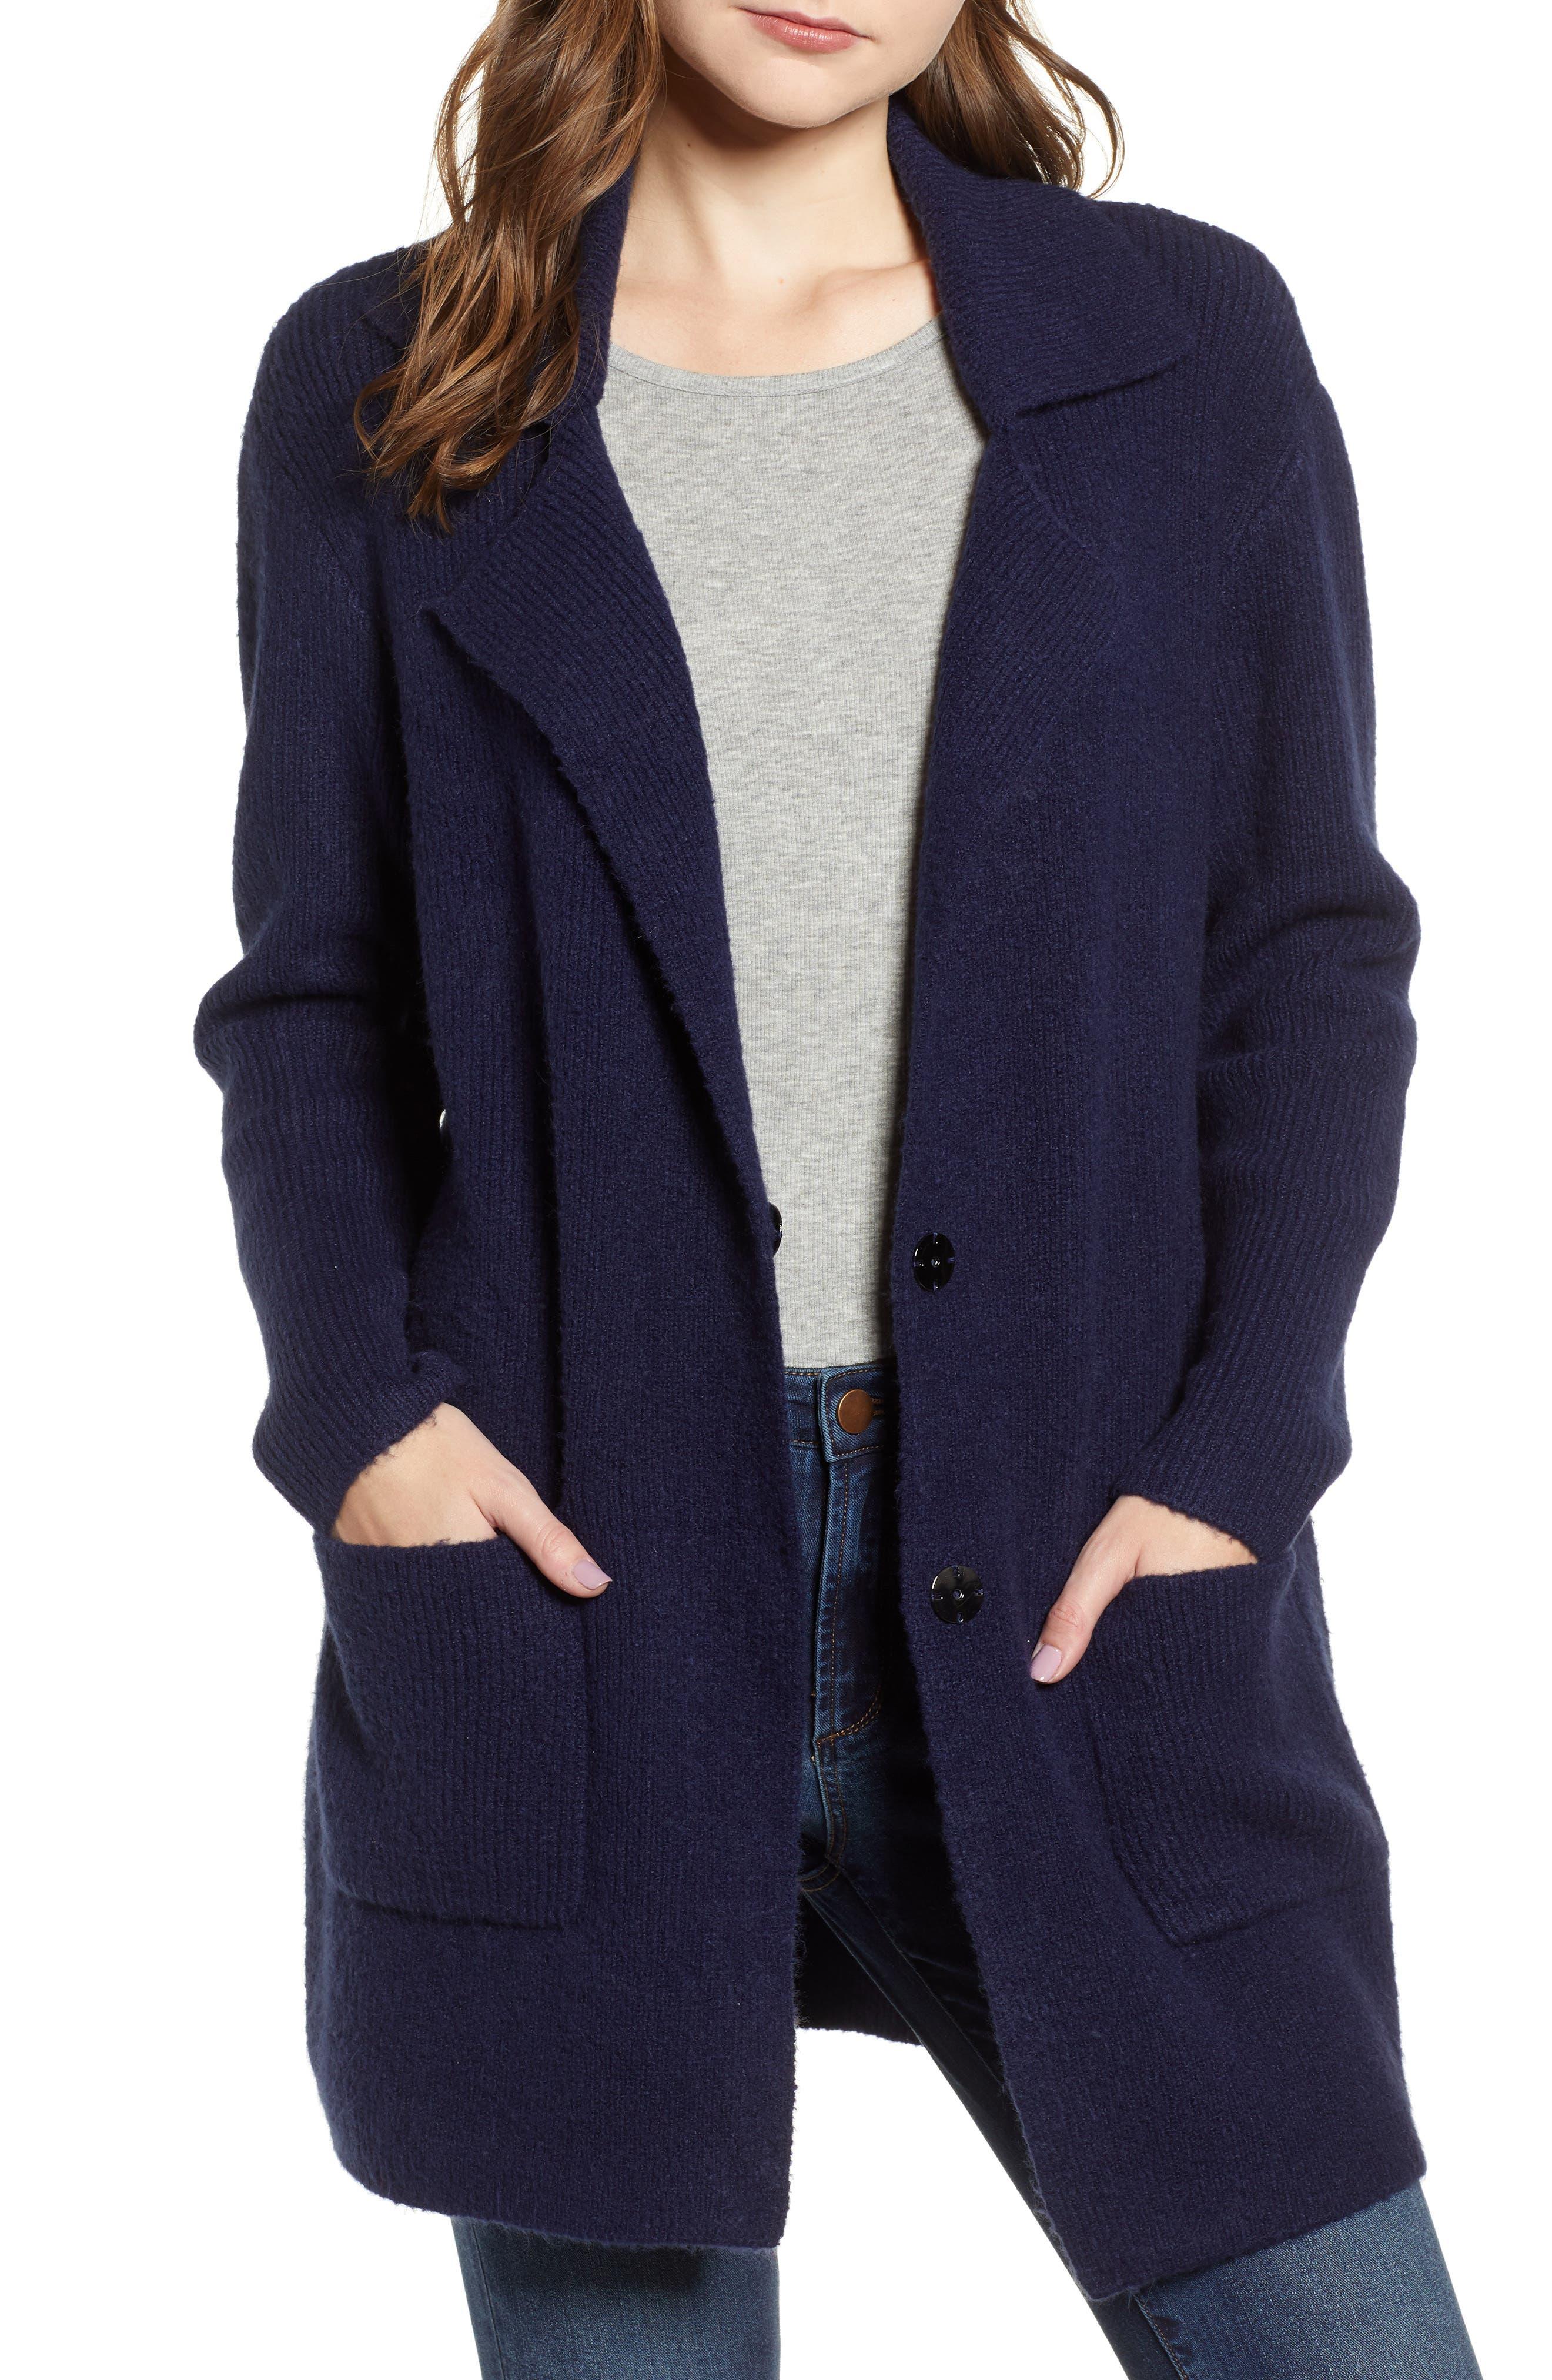 Knit Sweater Coat,                             Main thumbnail 1, color,                             NAVY MARITIME